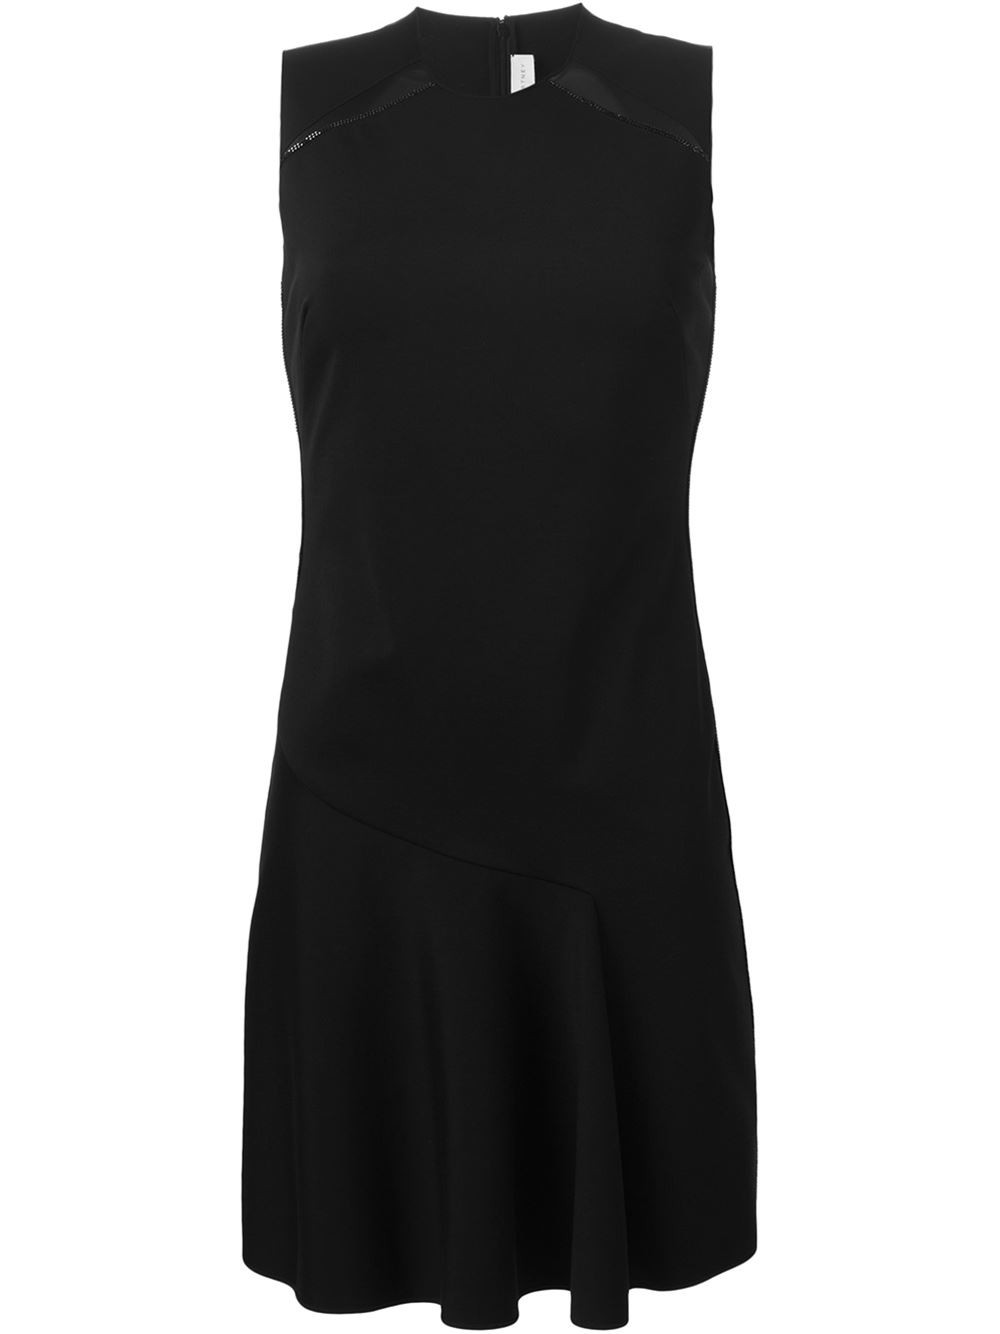 Stella Mccartney Willow Sleeveless Wrap-Detail Cotton Midi Dress, Dark Blue